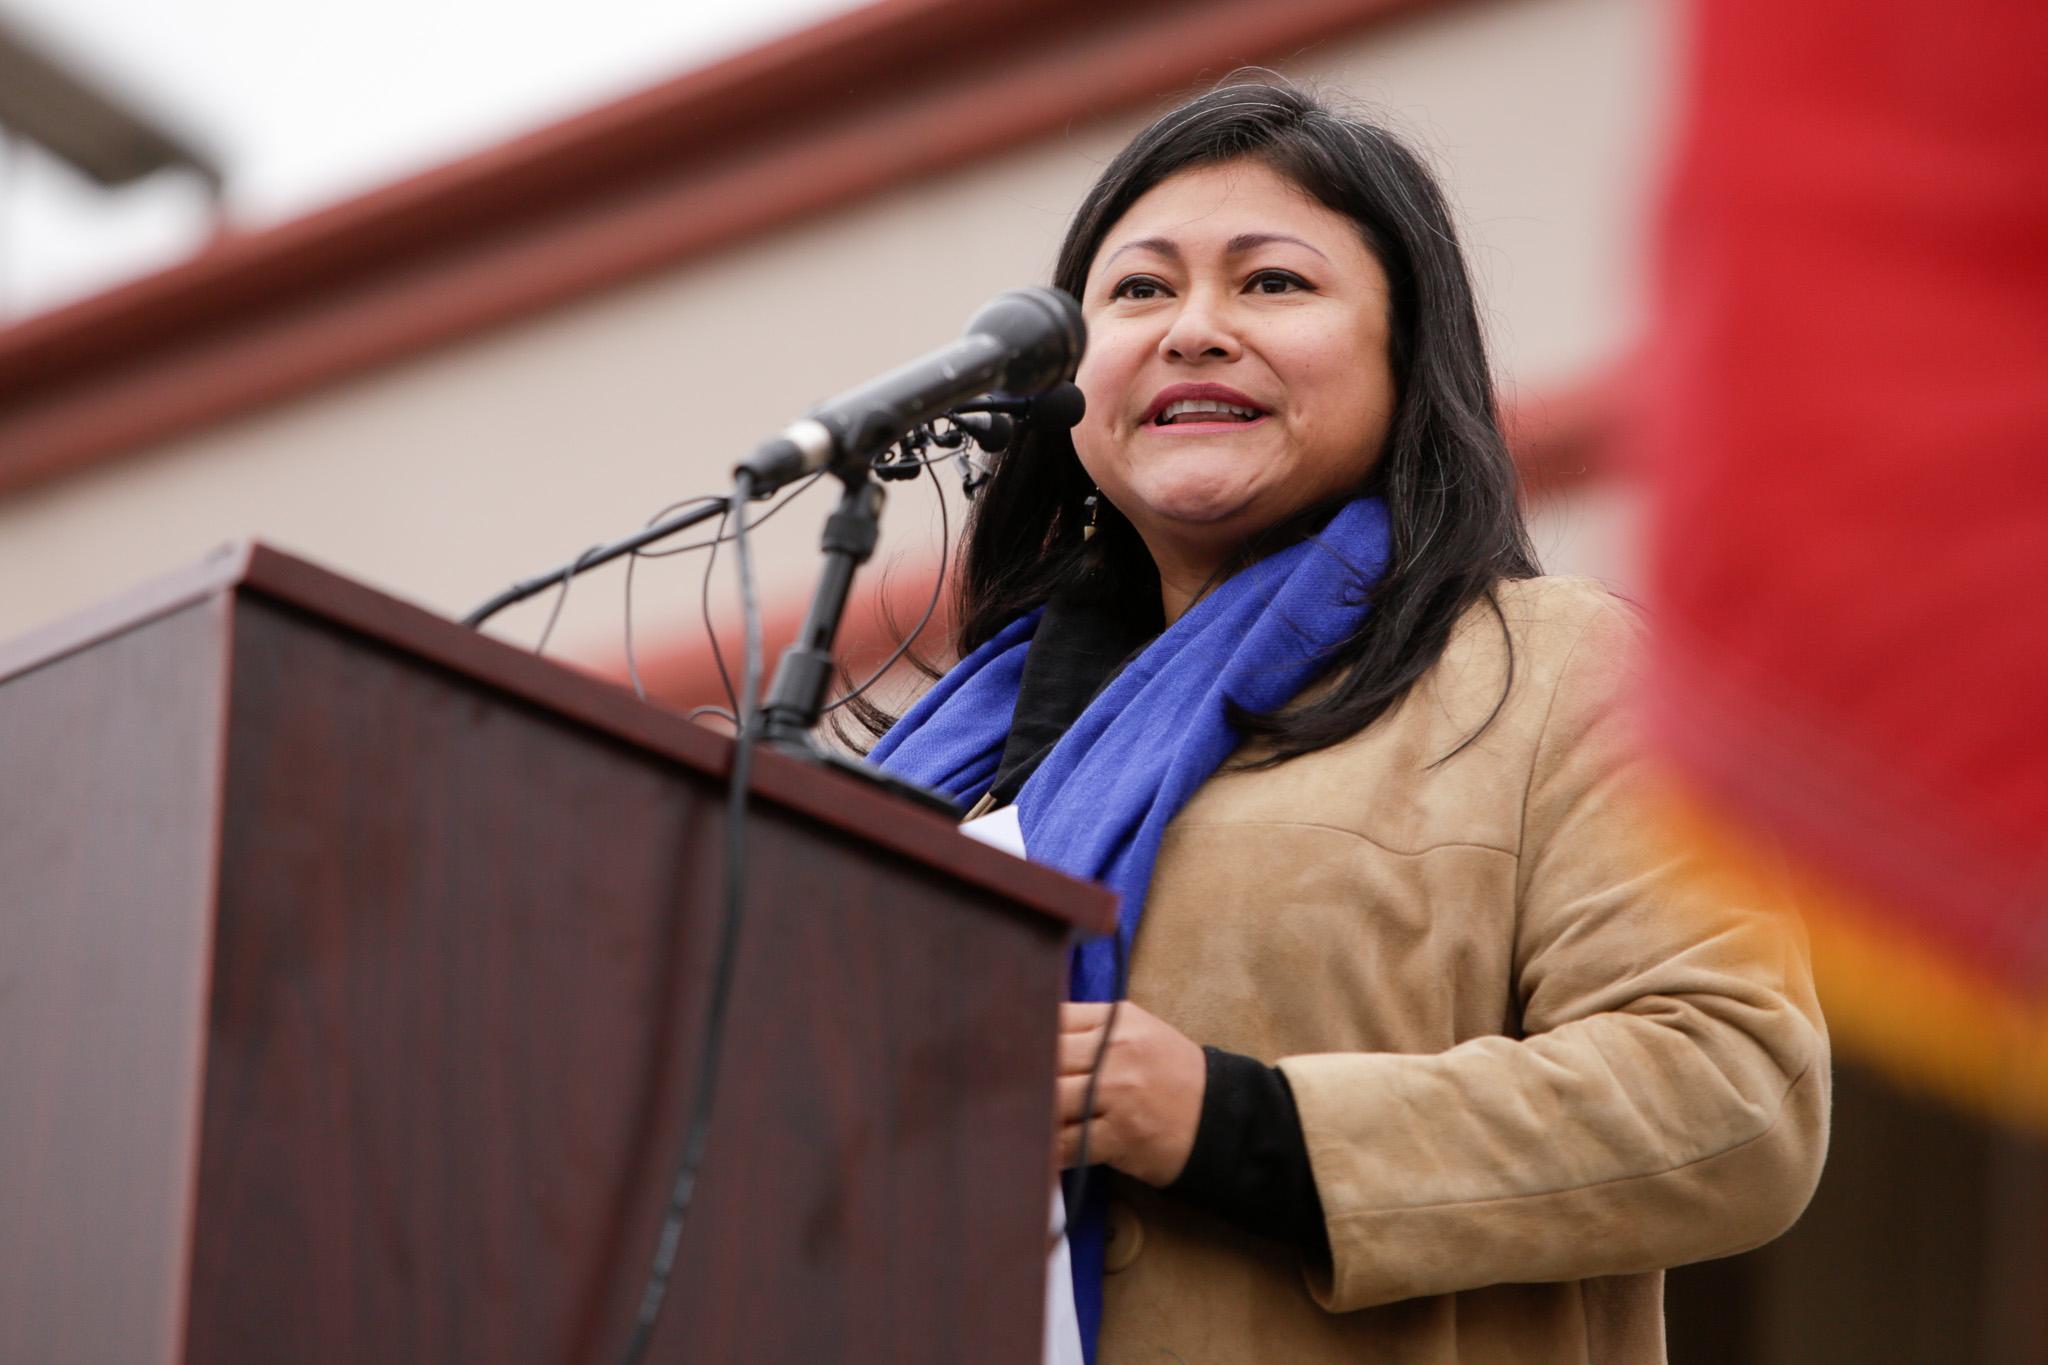 Erika Nirenberg speaks to her husbands commitment to the city of San Antonio.